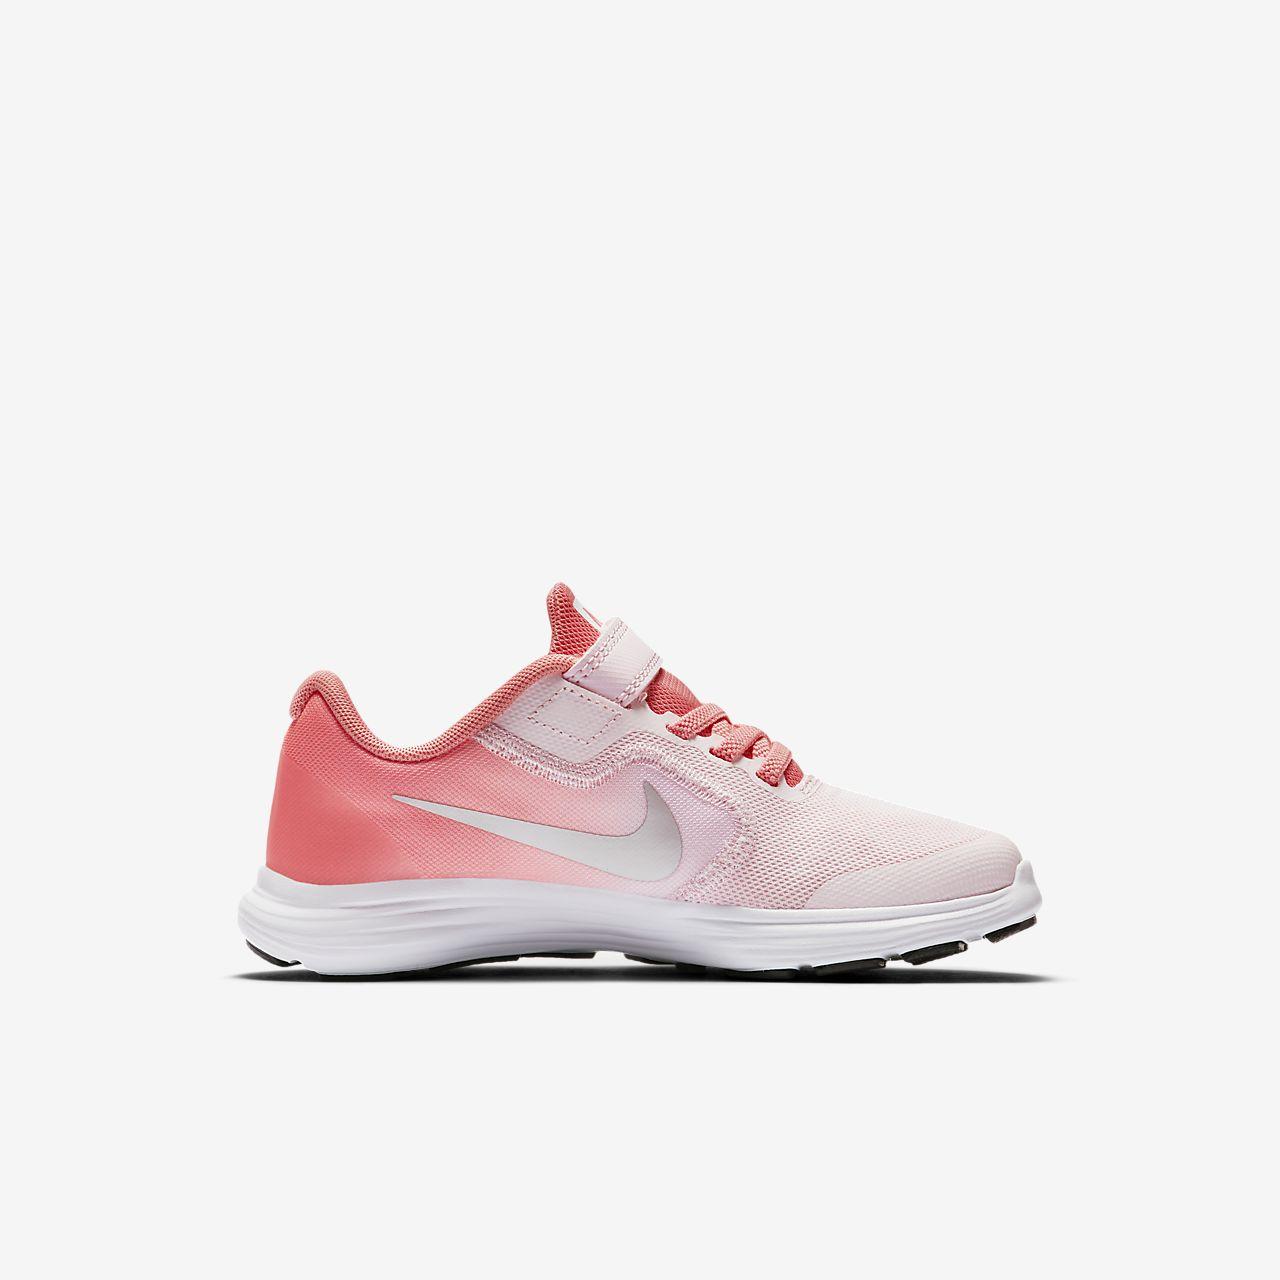 295c8e1390 Nike Futócipő 3 Nike 3 Revolution Revolution GyerekeknekHu Futócipő  GyerekeknekHu 1cTFJ3Kl